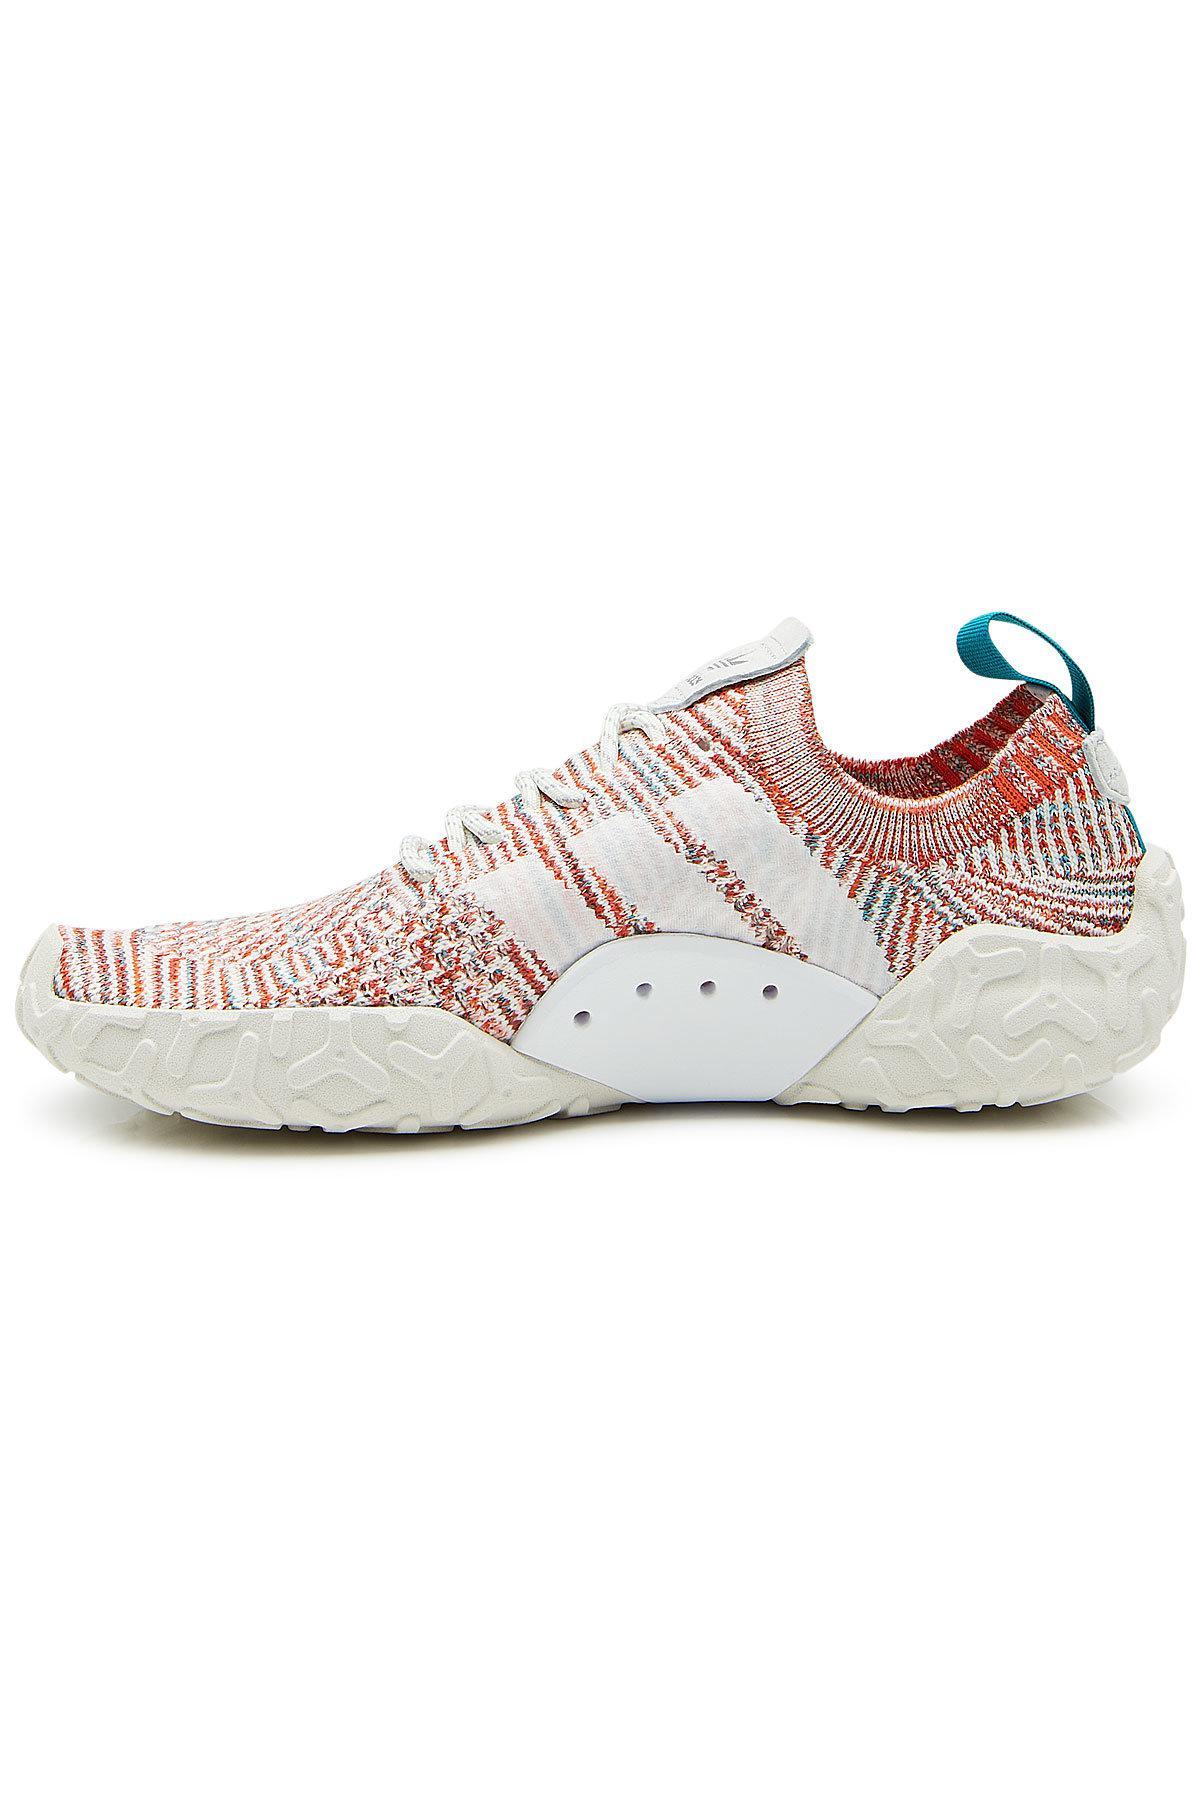 factory authentic 76b5b 9ee4b Lyst - adidas Originals Atric F22 Primeknit Sneakers for Men